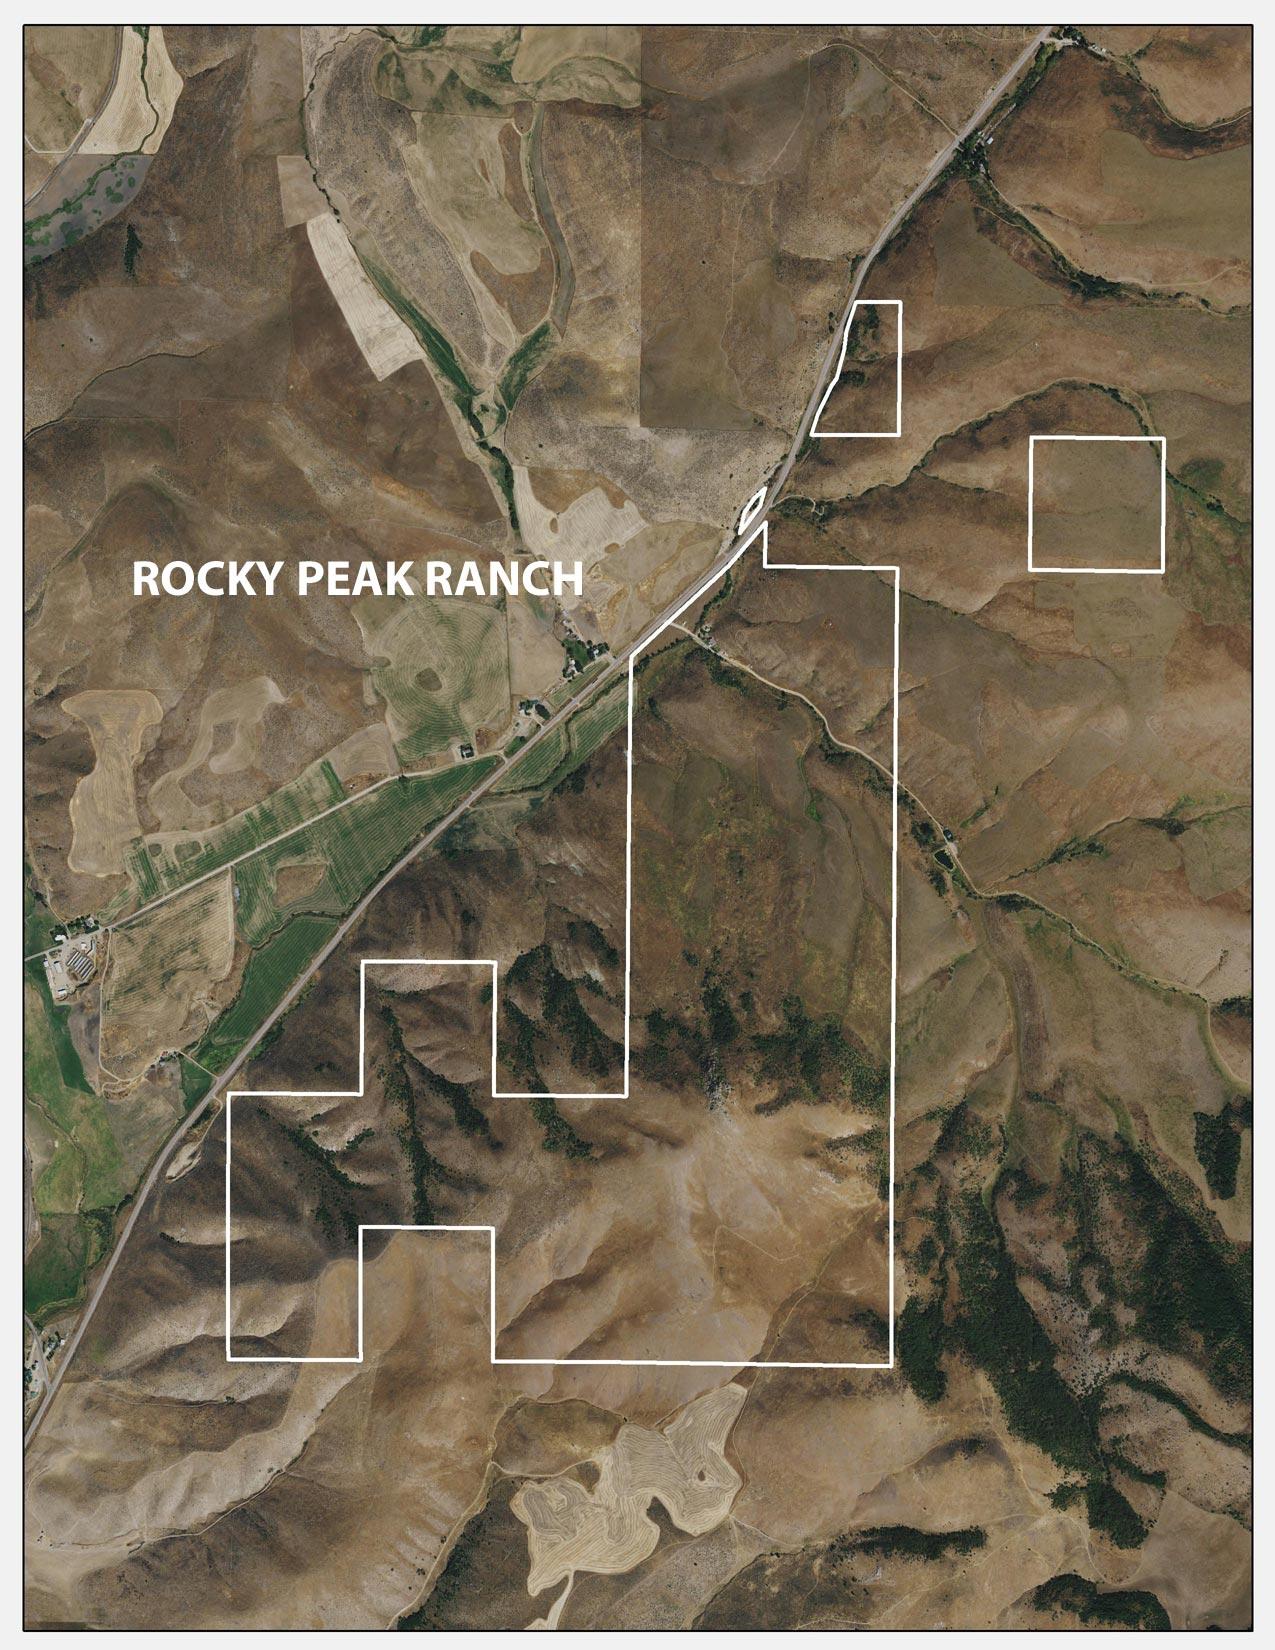 Rocky Peak Ranch - Aerial Map - Idaho